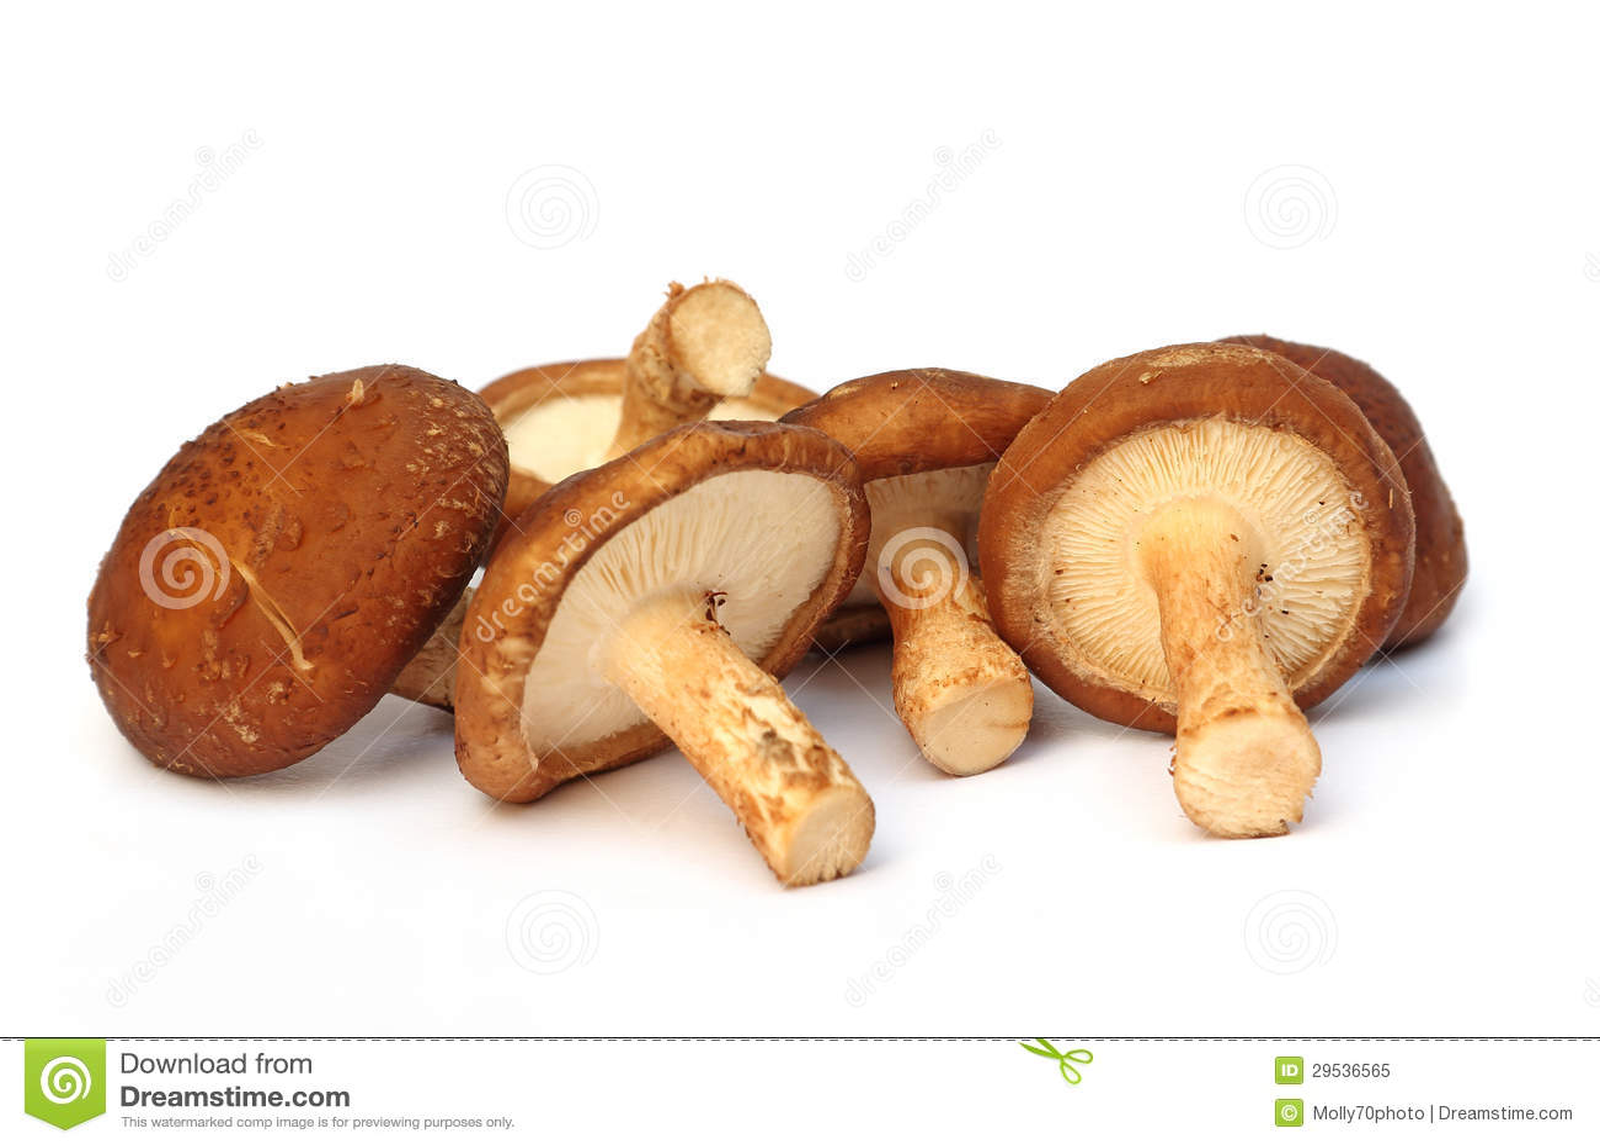 Cogumelo fresco no fundo branco